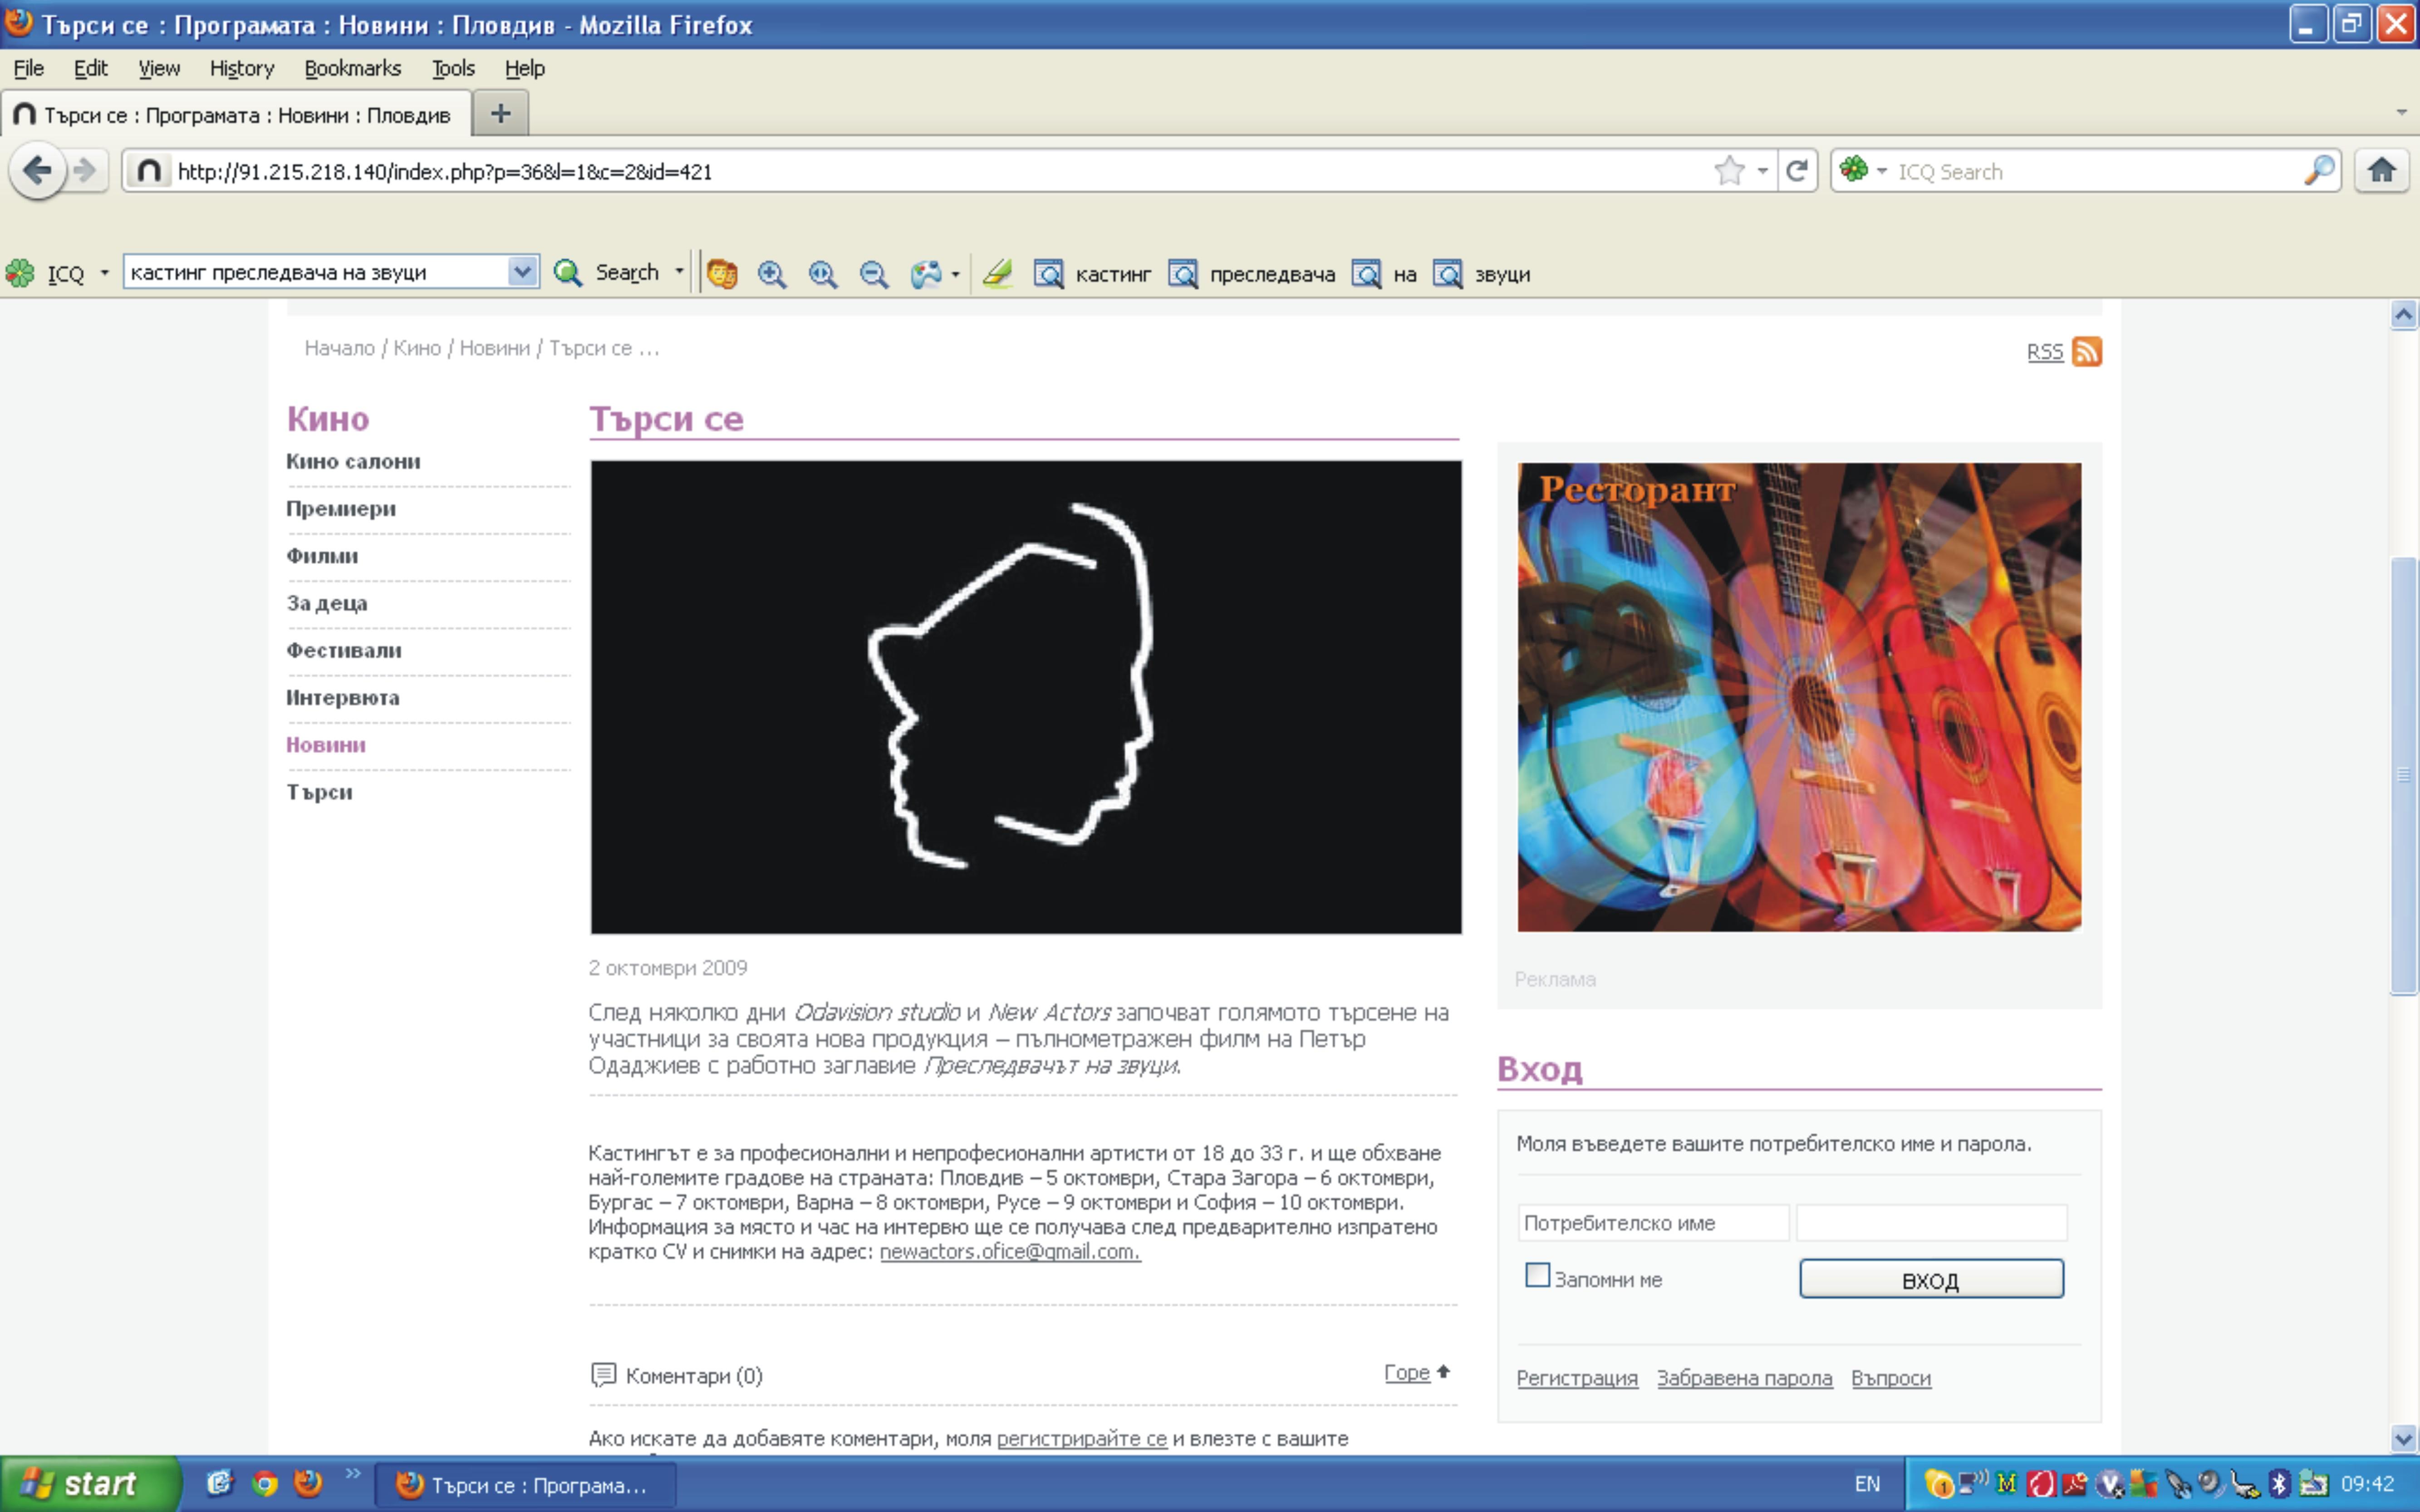 http://www.public-republic.com/magazine/2009/04/18595.php